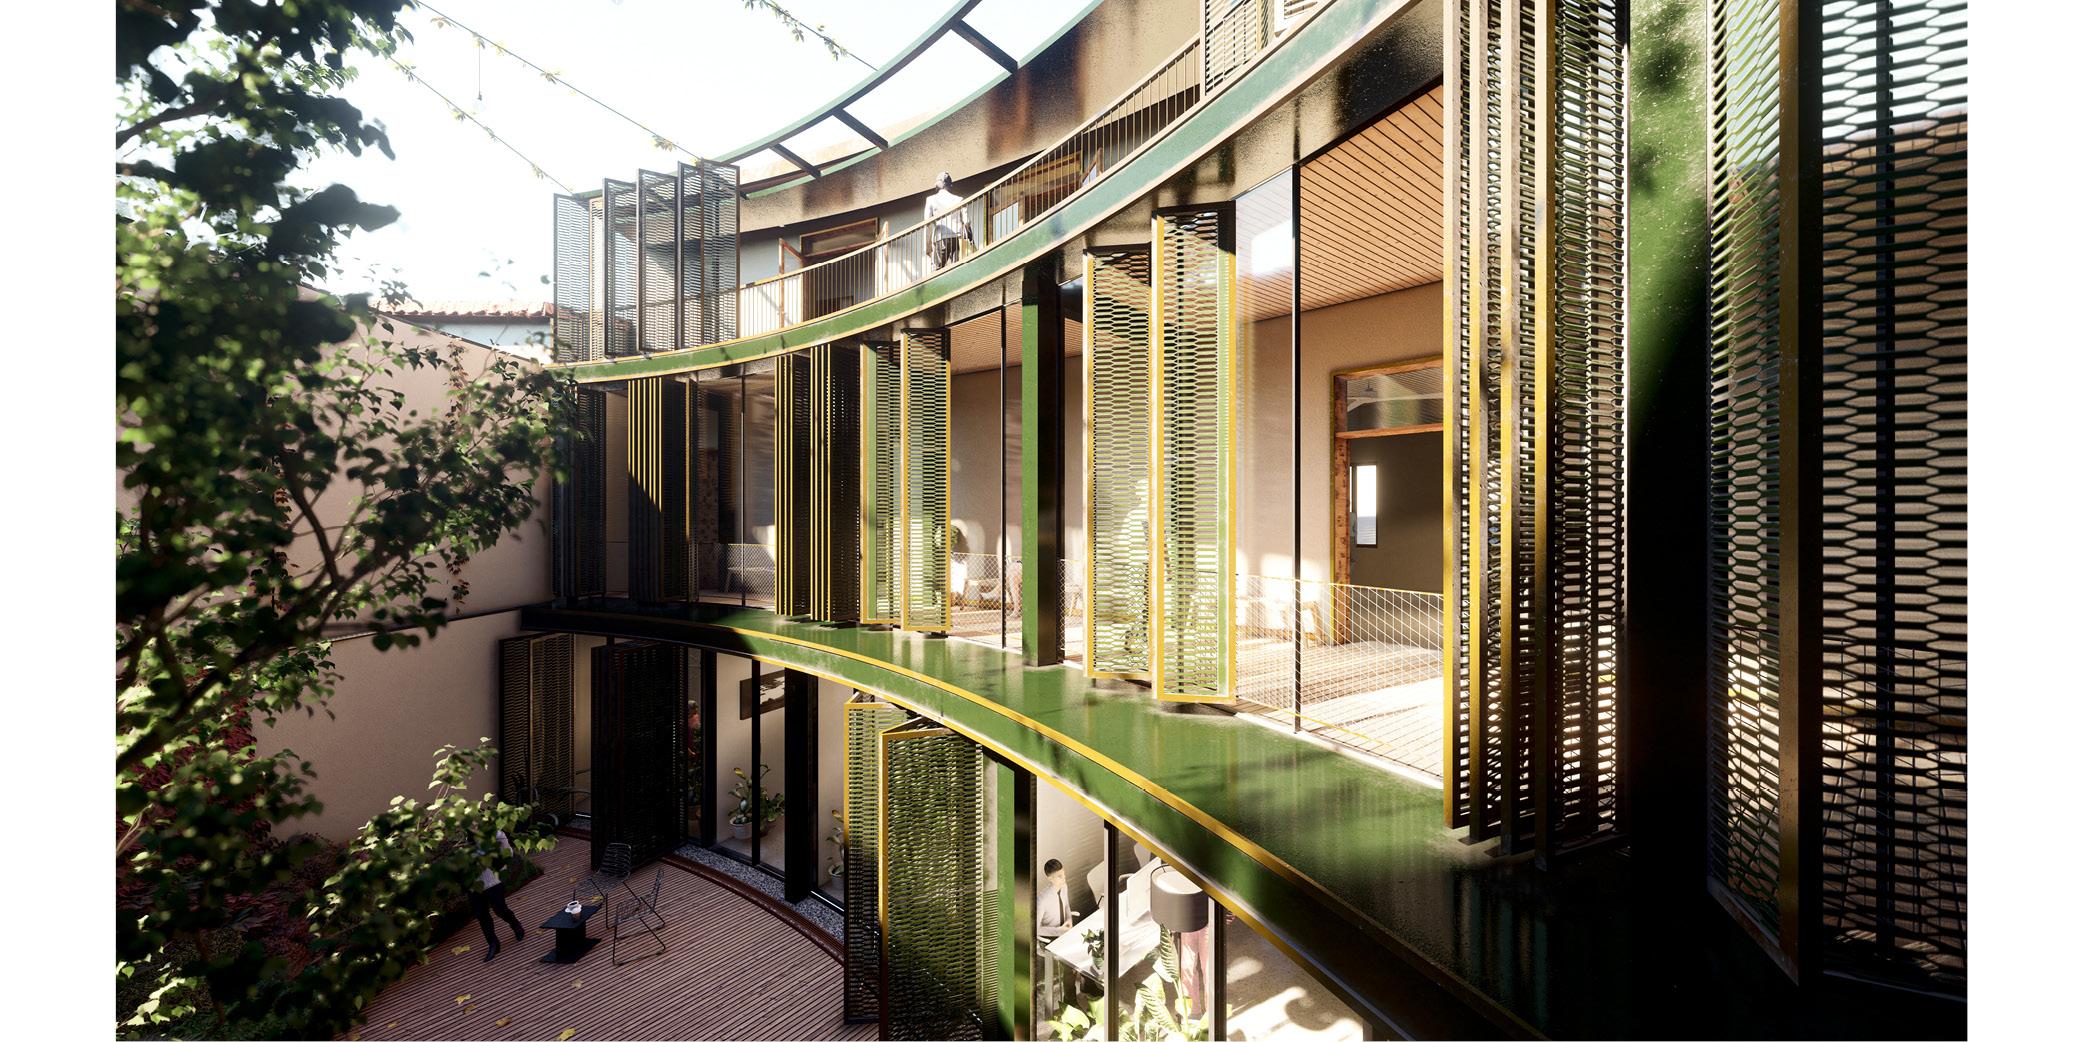 Daganzo City Hall Extention Architecture Arquitectura OCA ARCHITECTS OCA arquitectas Hernan Lleida Bernardo Garcia_4